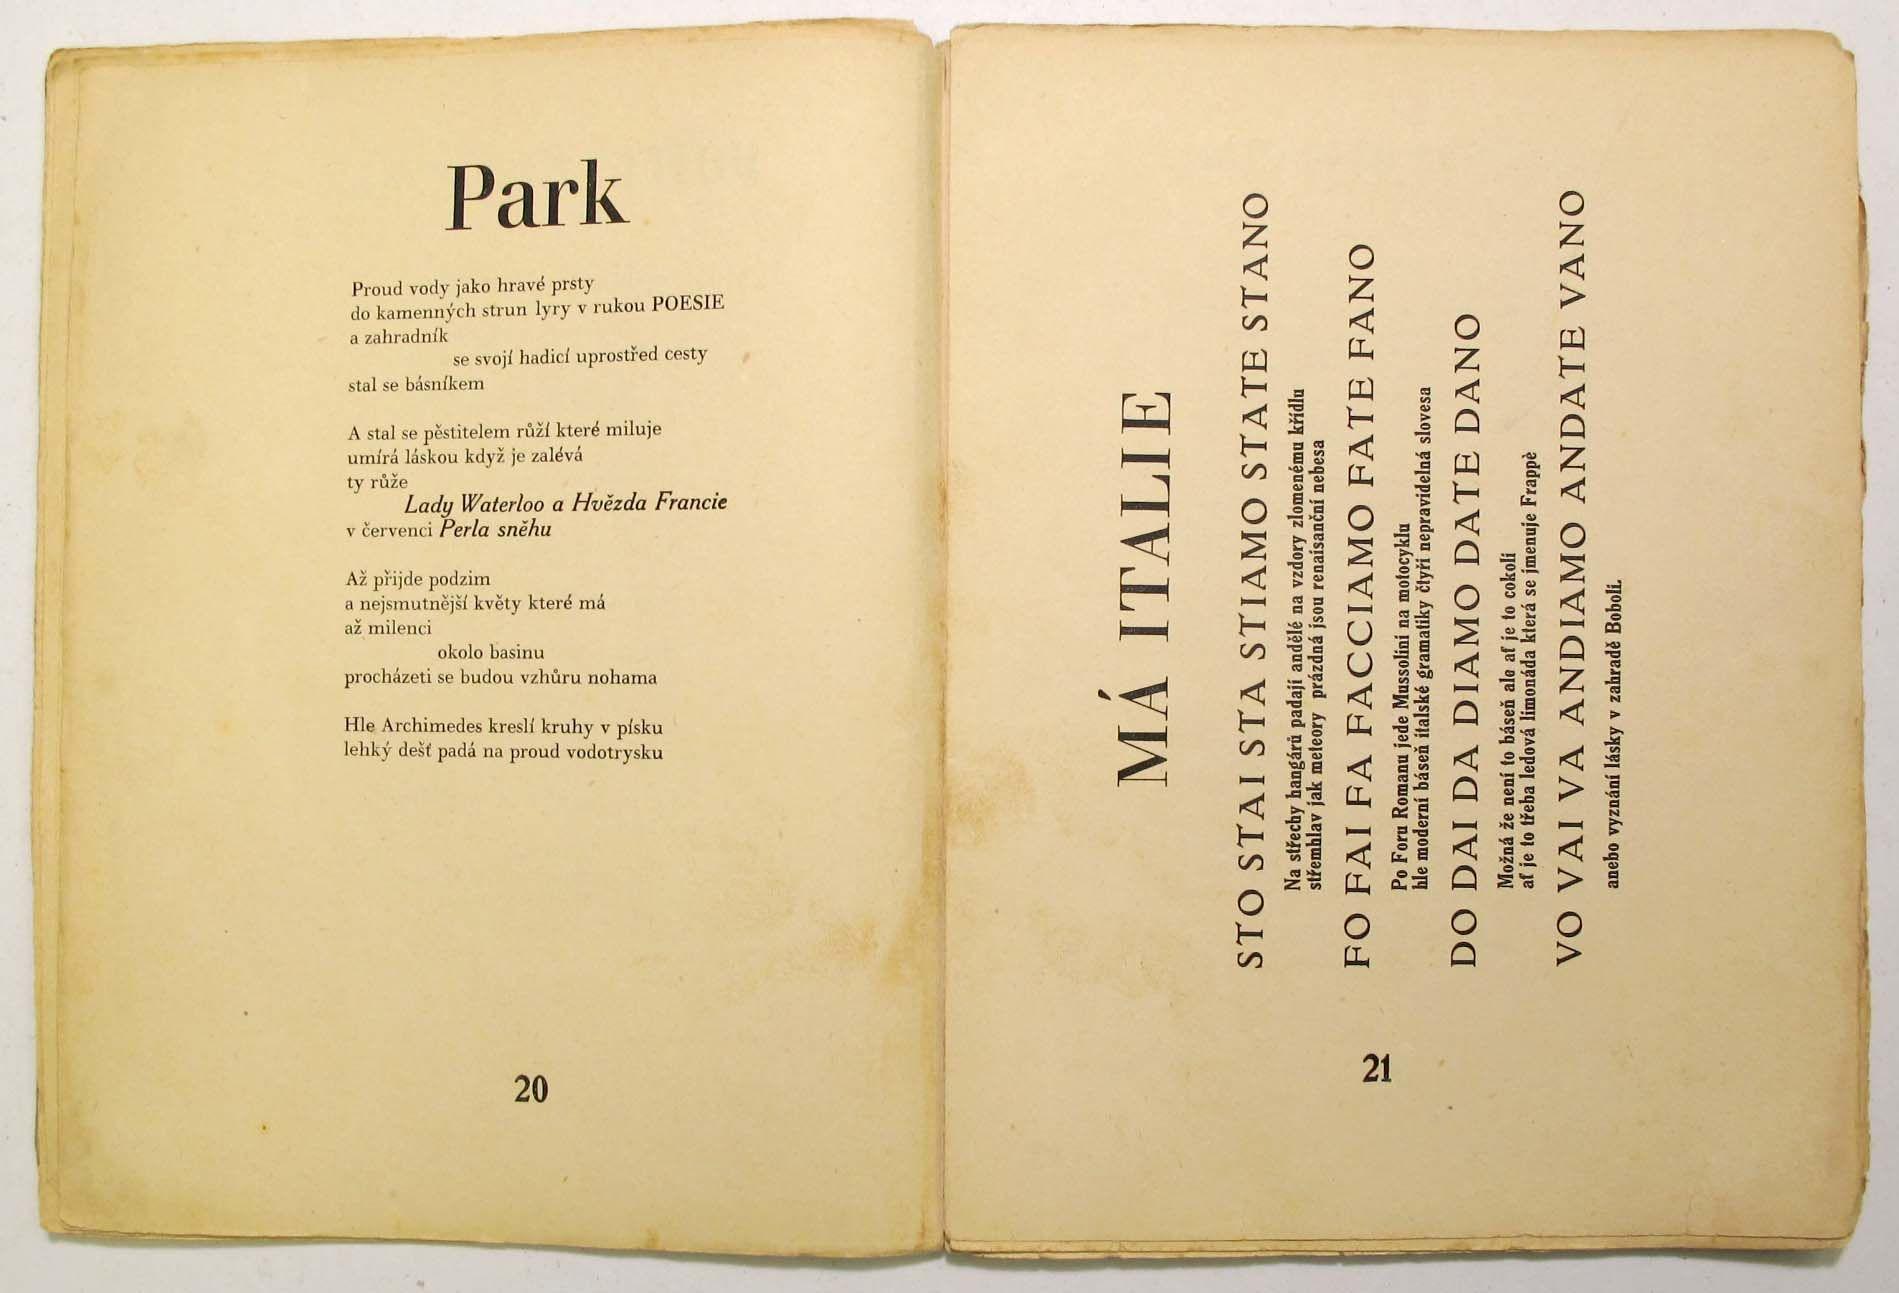 Jaroslav Seifert Na Vlnach Tsf Karel Teige 1925 Book Cover Fate Fano